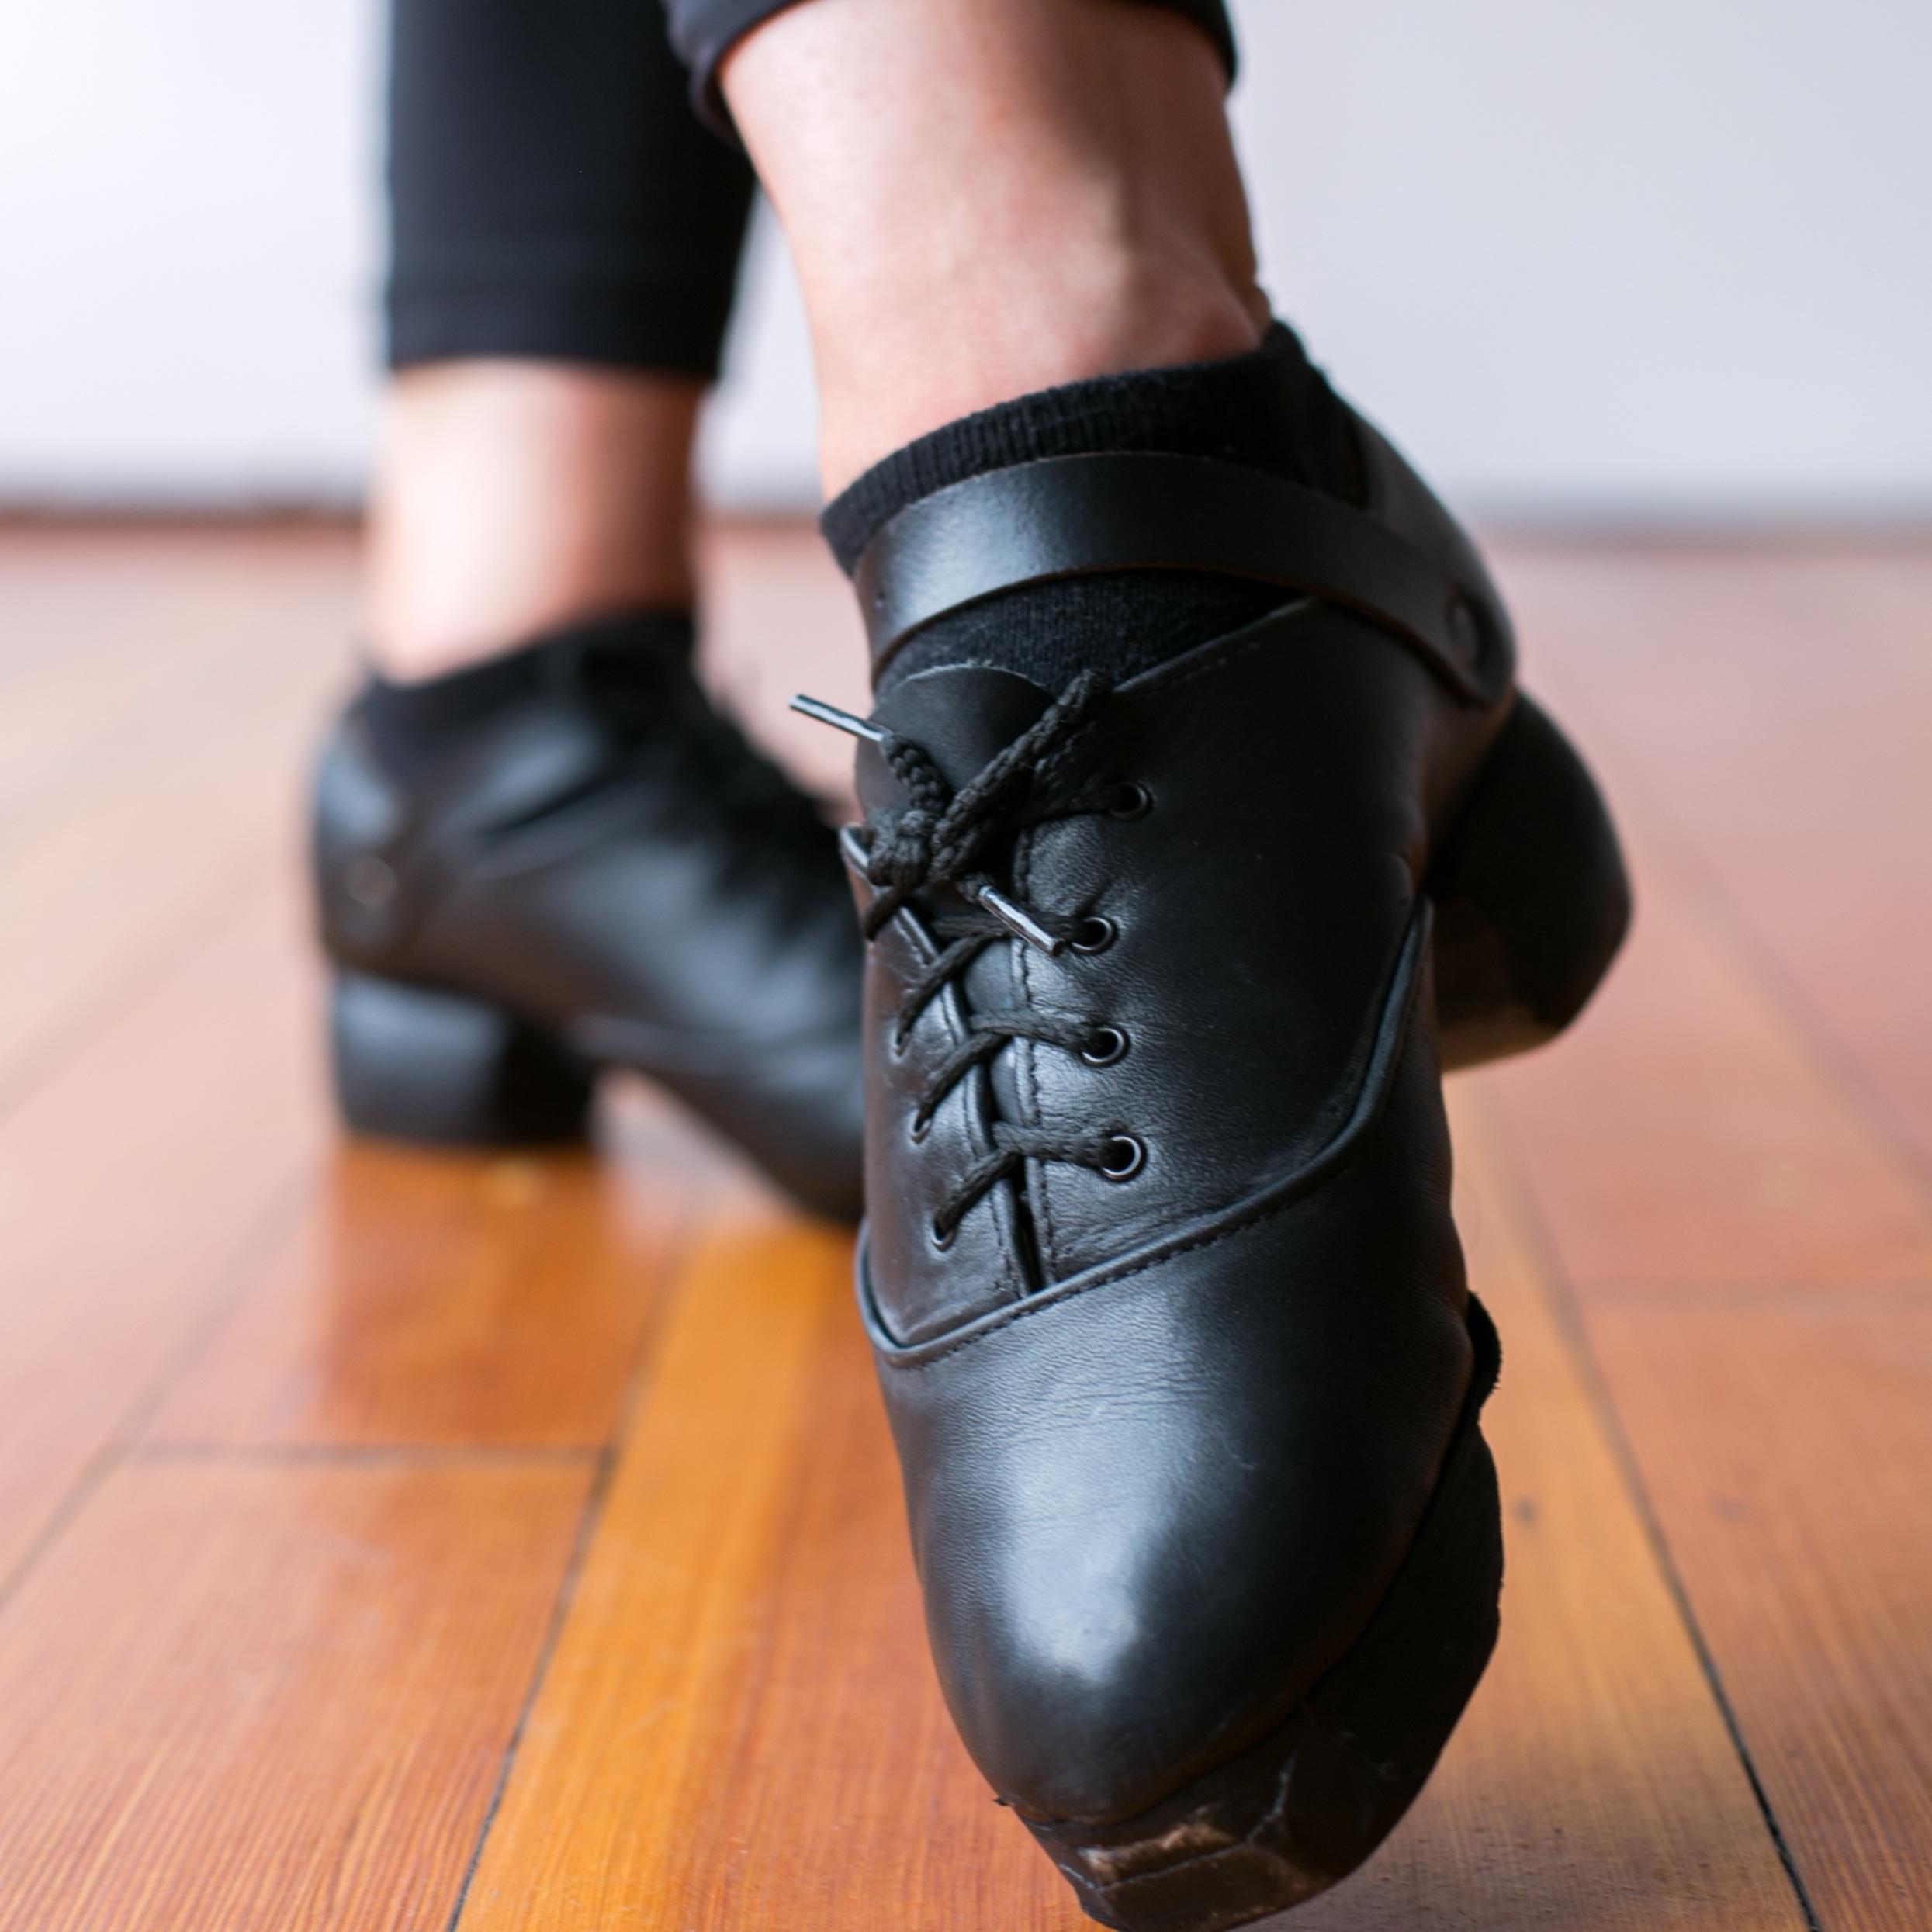 Learn - Fundamental skillsStyles + TechniqueCeili dances for groups